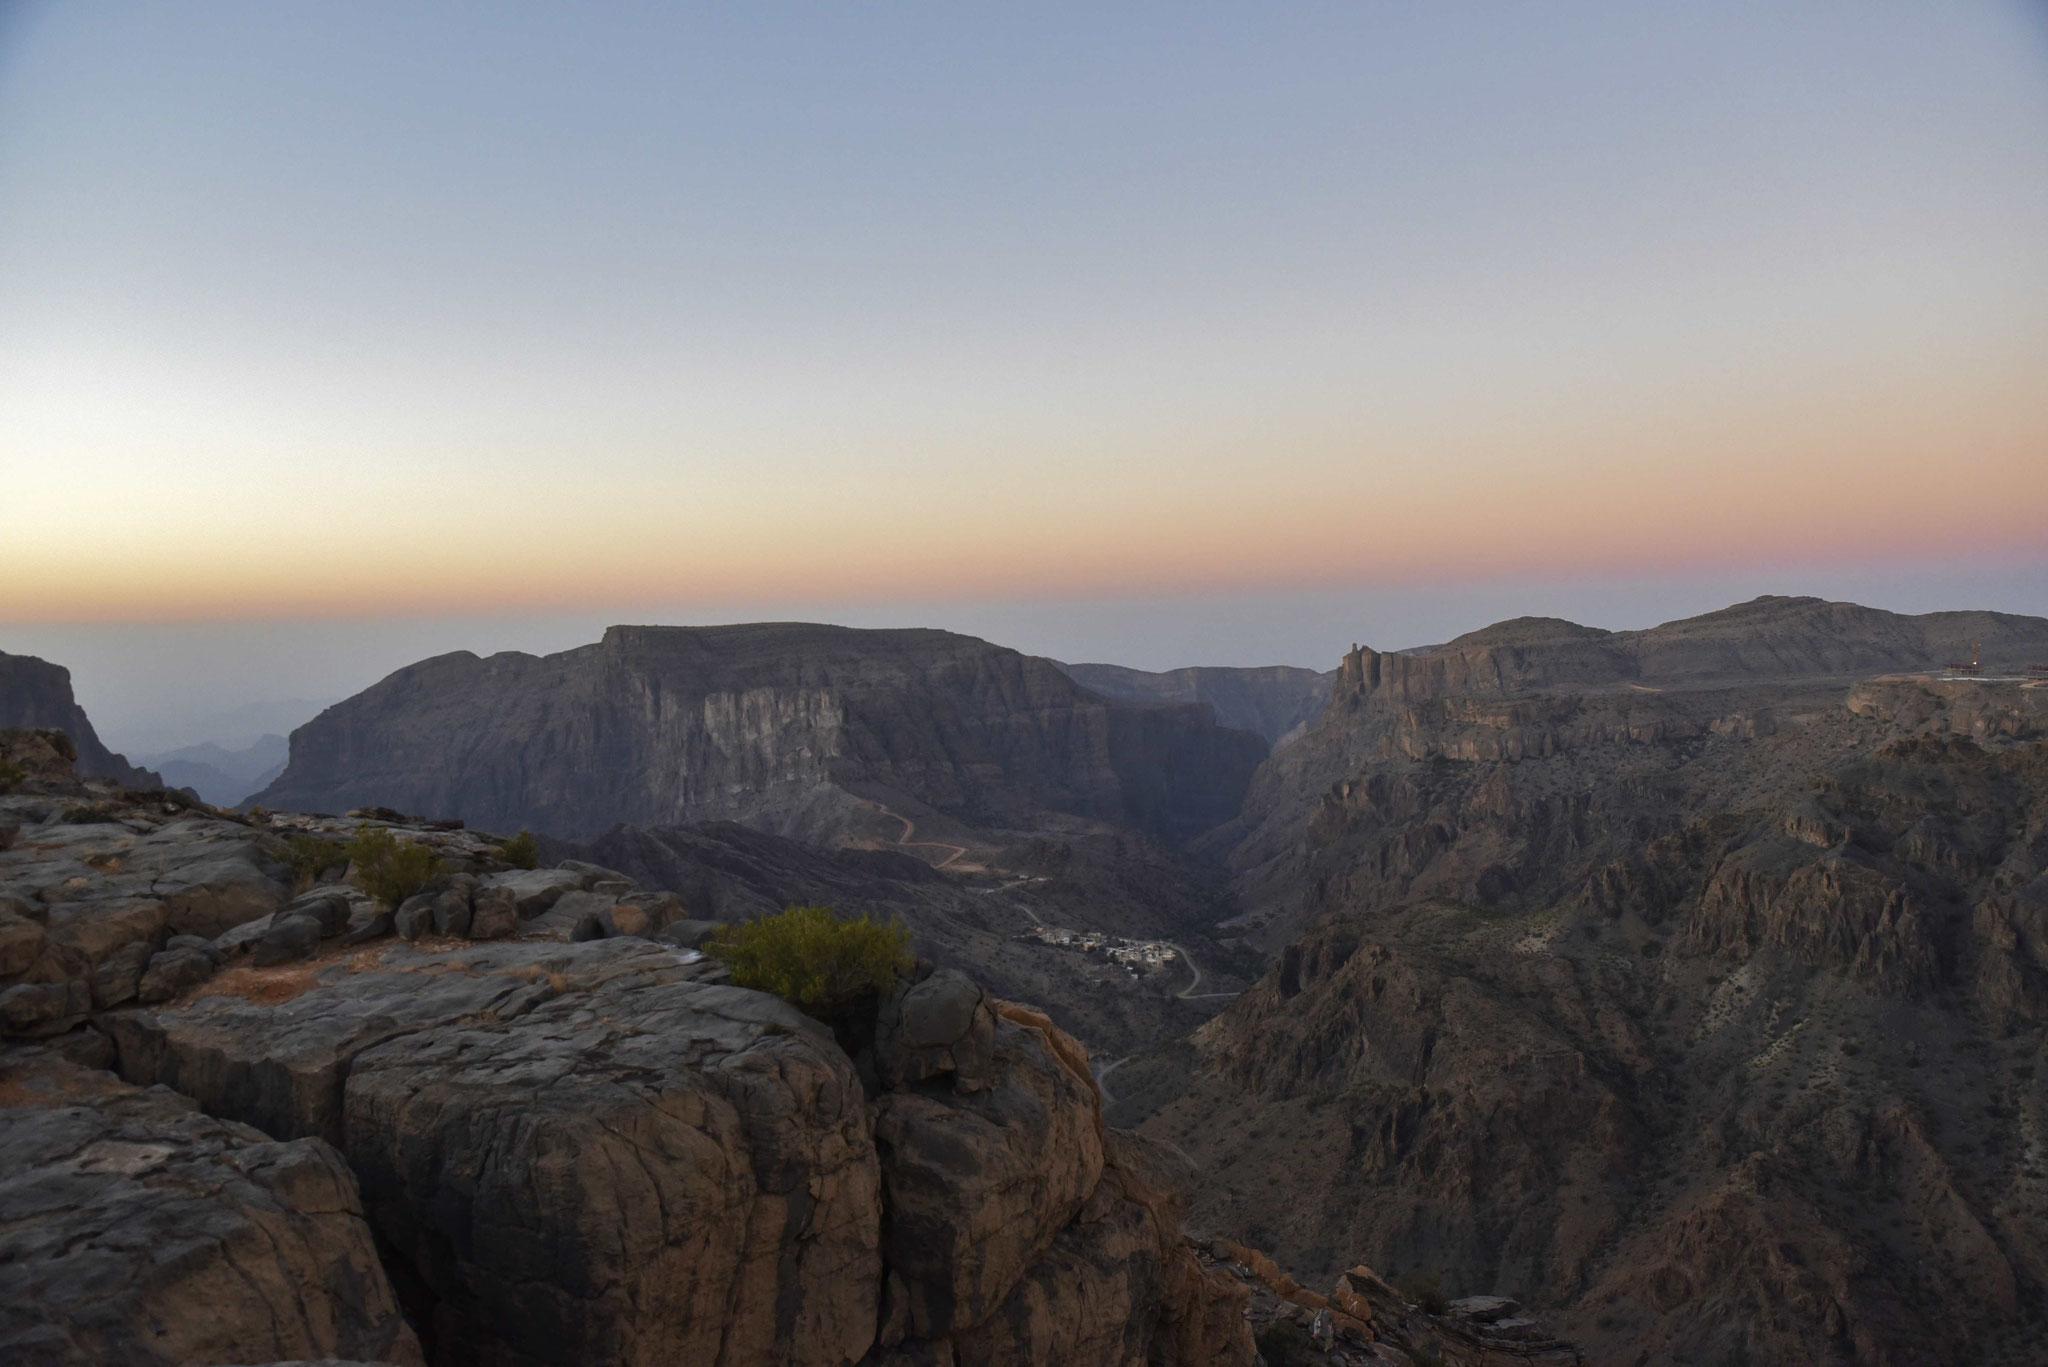 Sonnenaufgang am Jebel Akhdar I